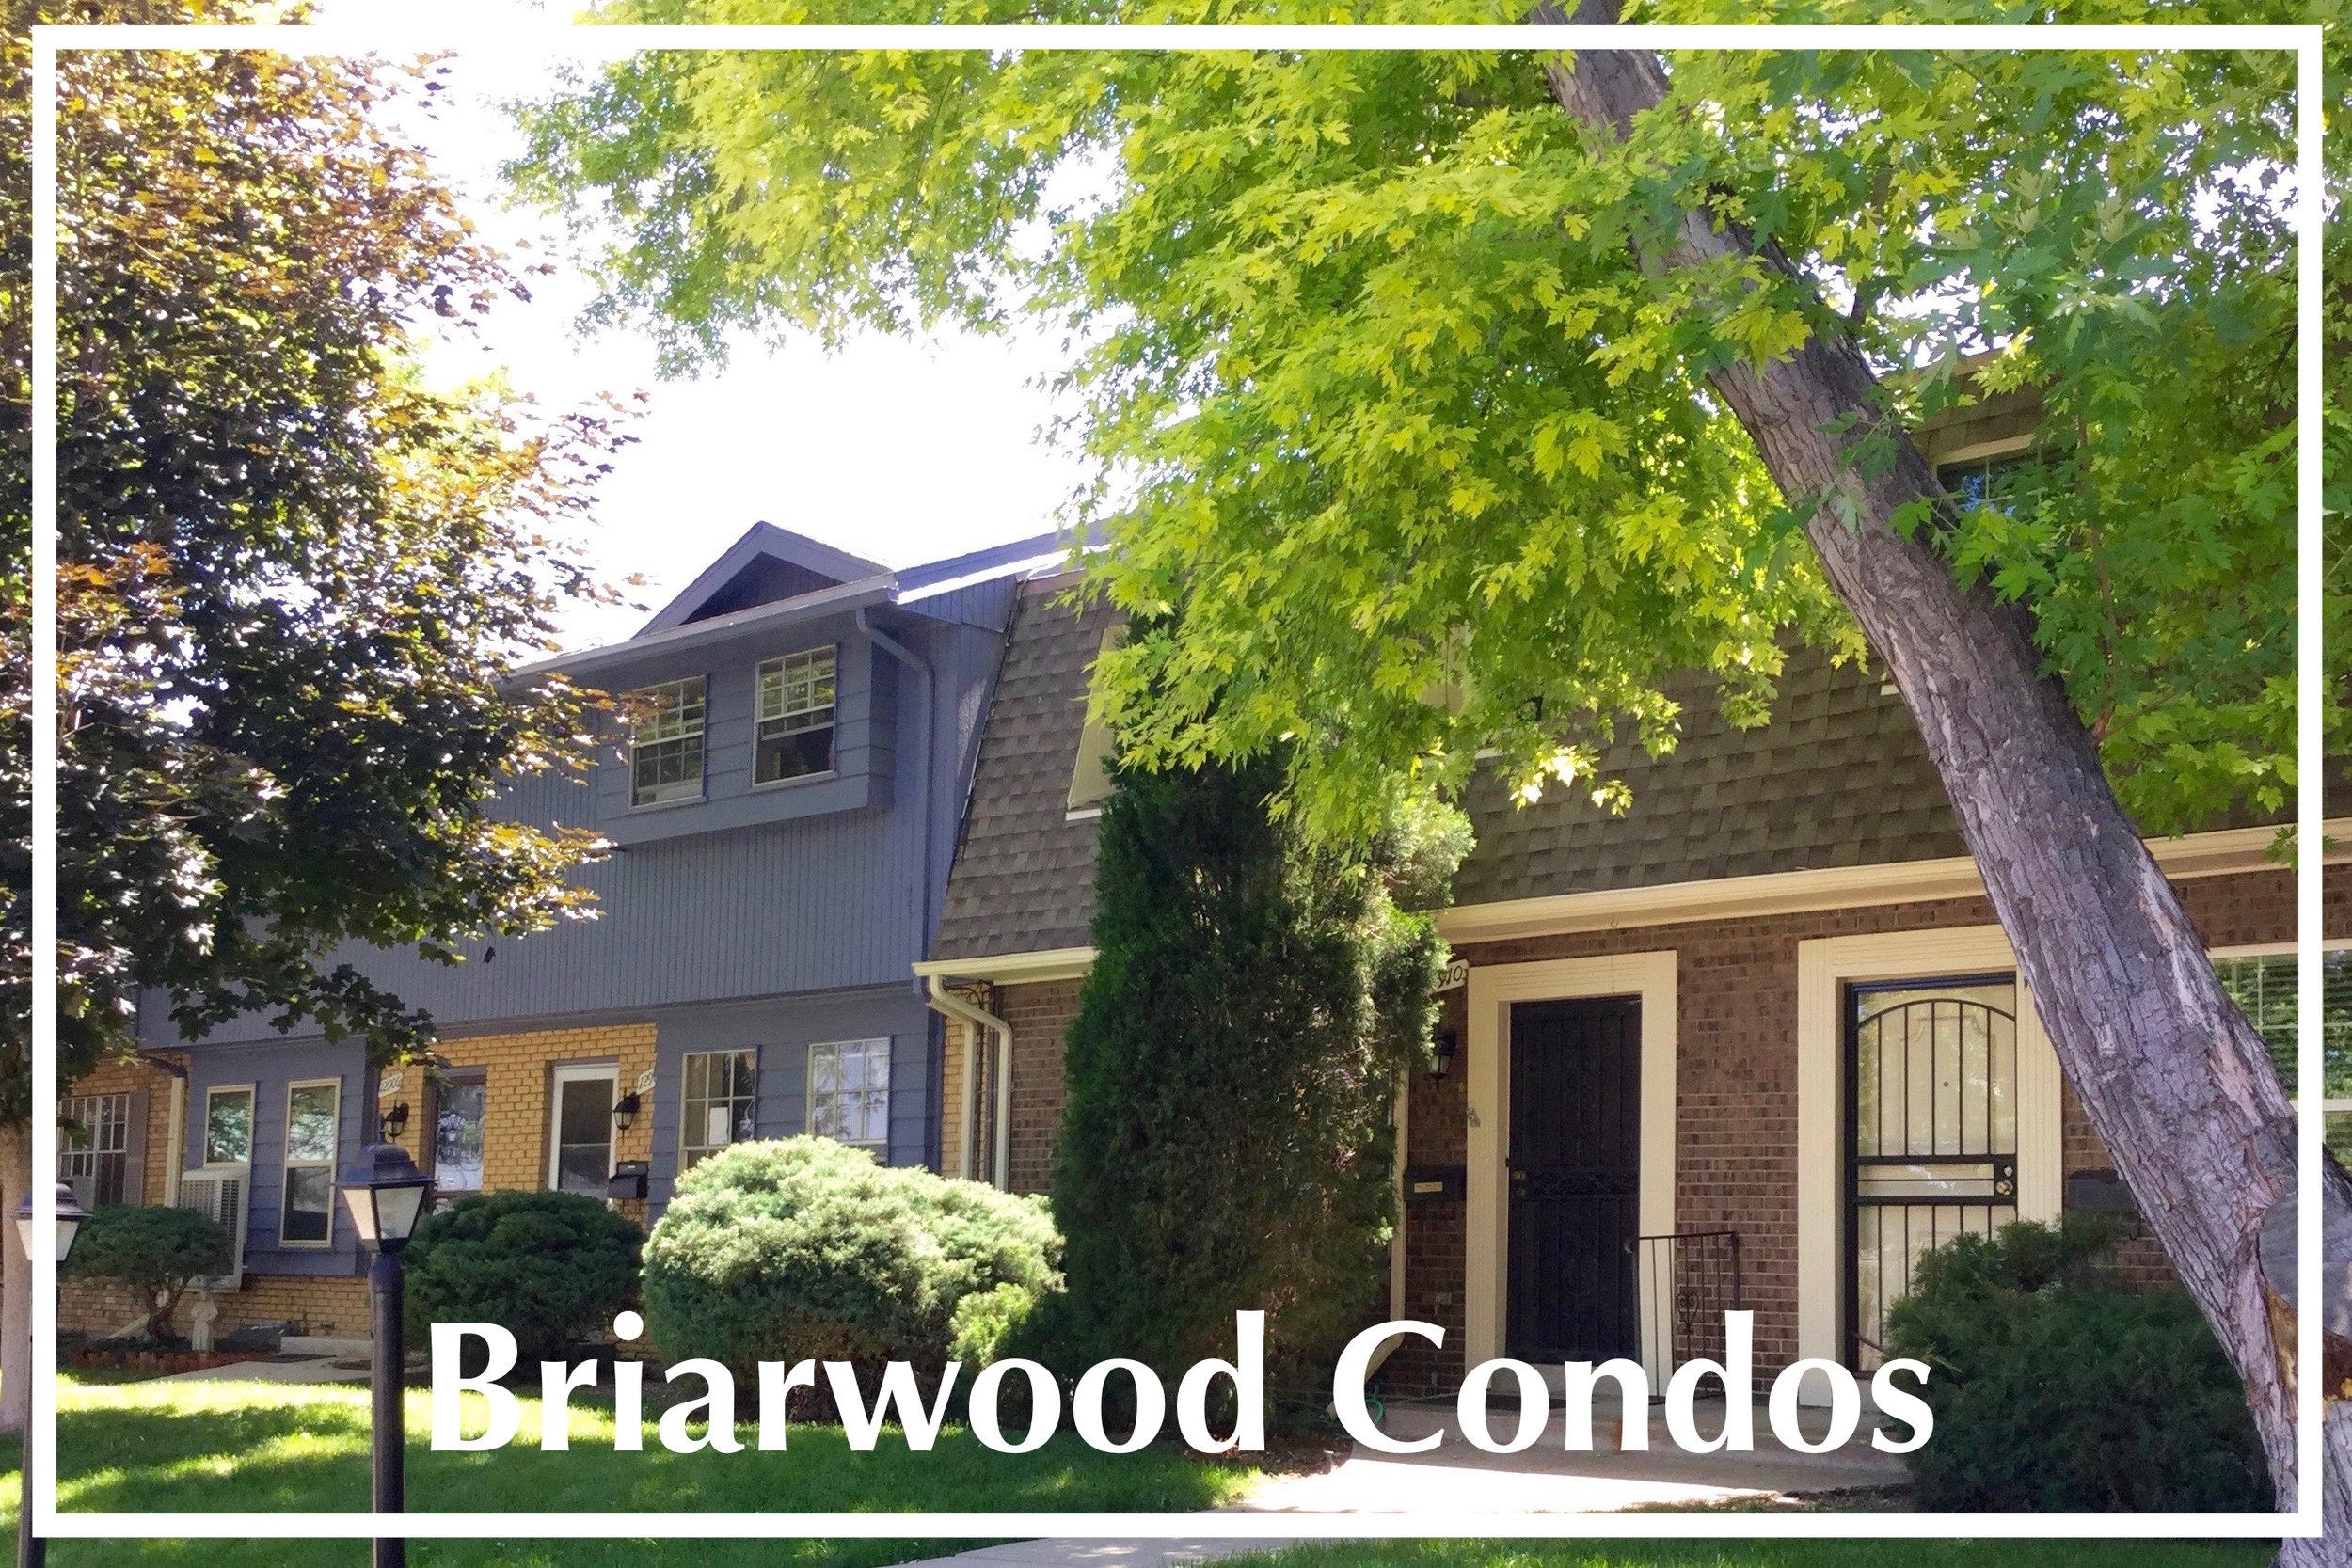 Briarwood Condos.jpg